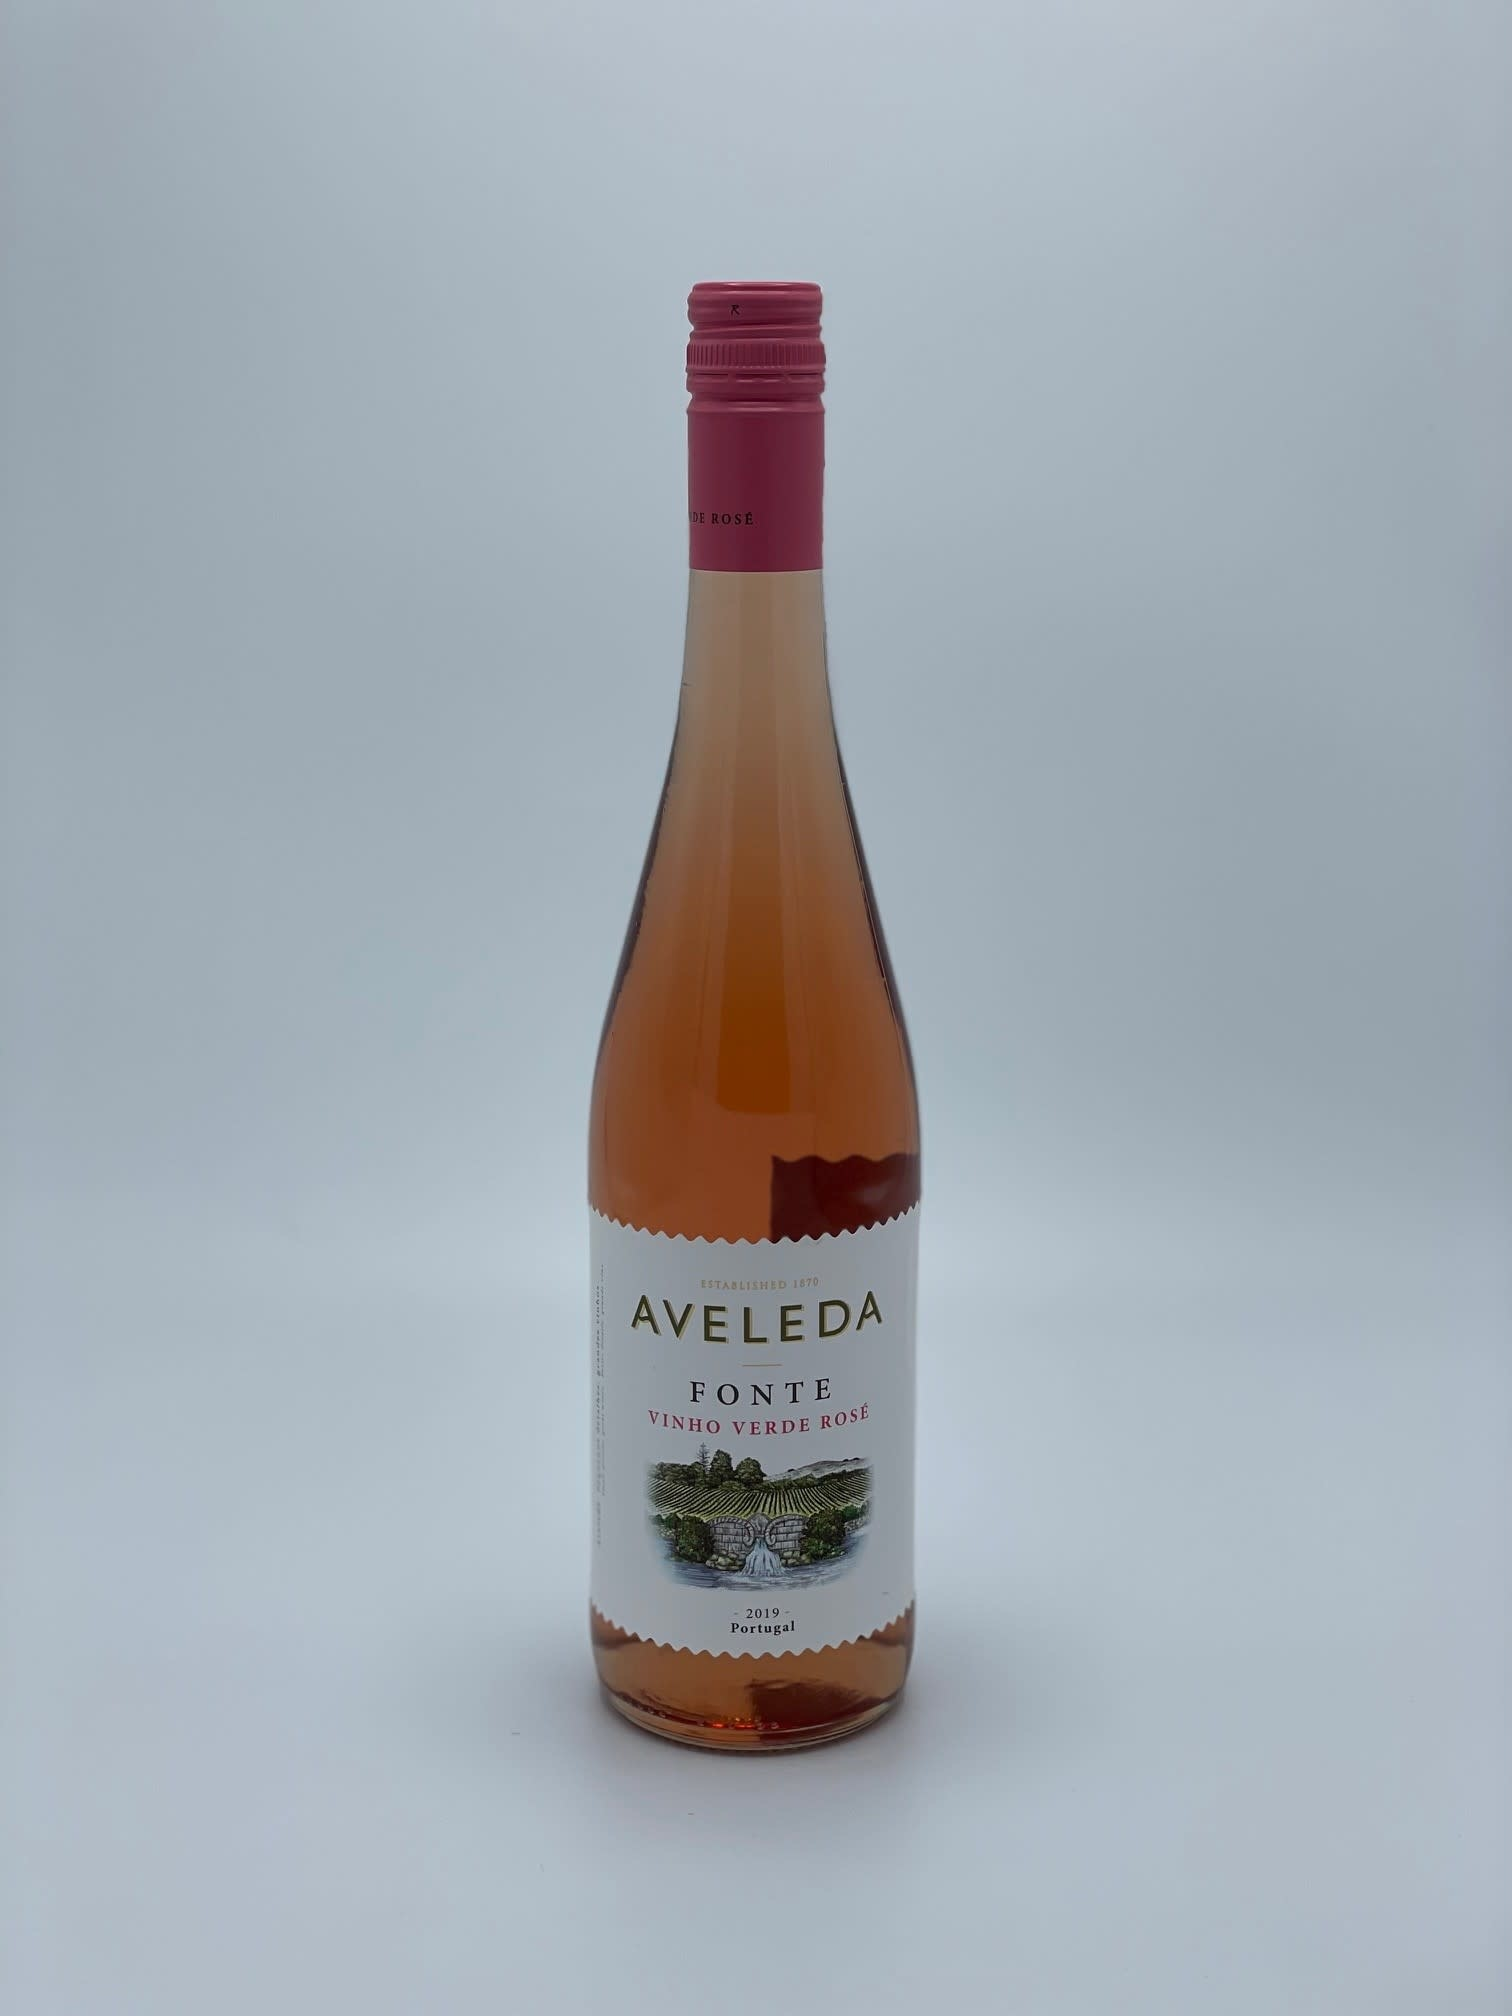 Aveleda - Fonte Vinho Verde Rosé-2